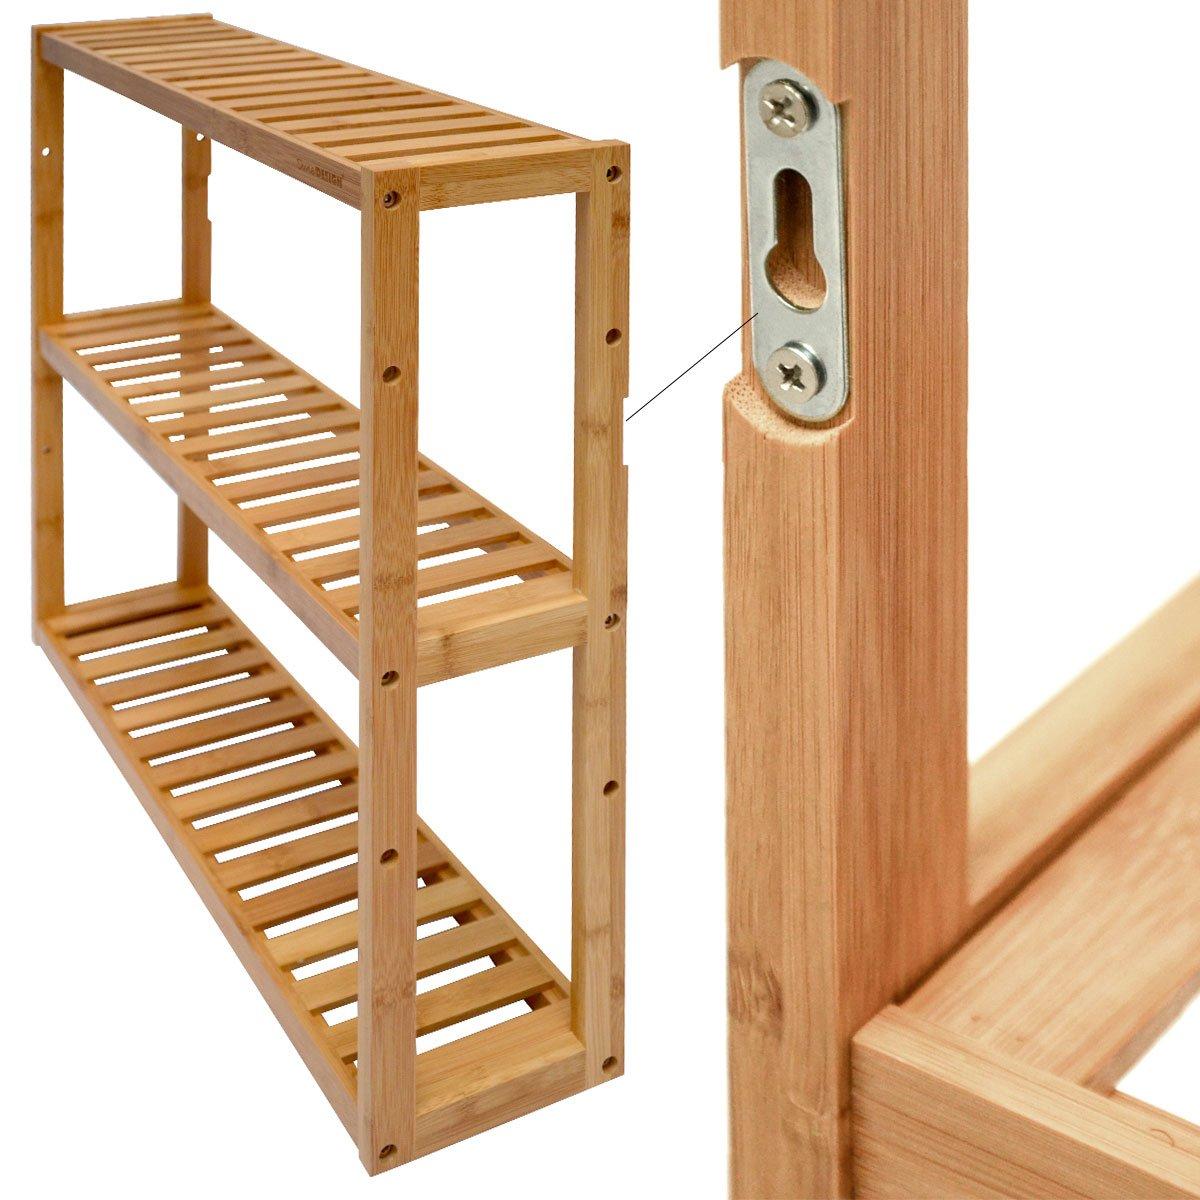 Dunedesign Wandregal 54x60x15cm Bambus Bad Regal 3 F A Cher Holz